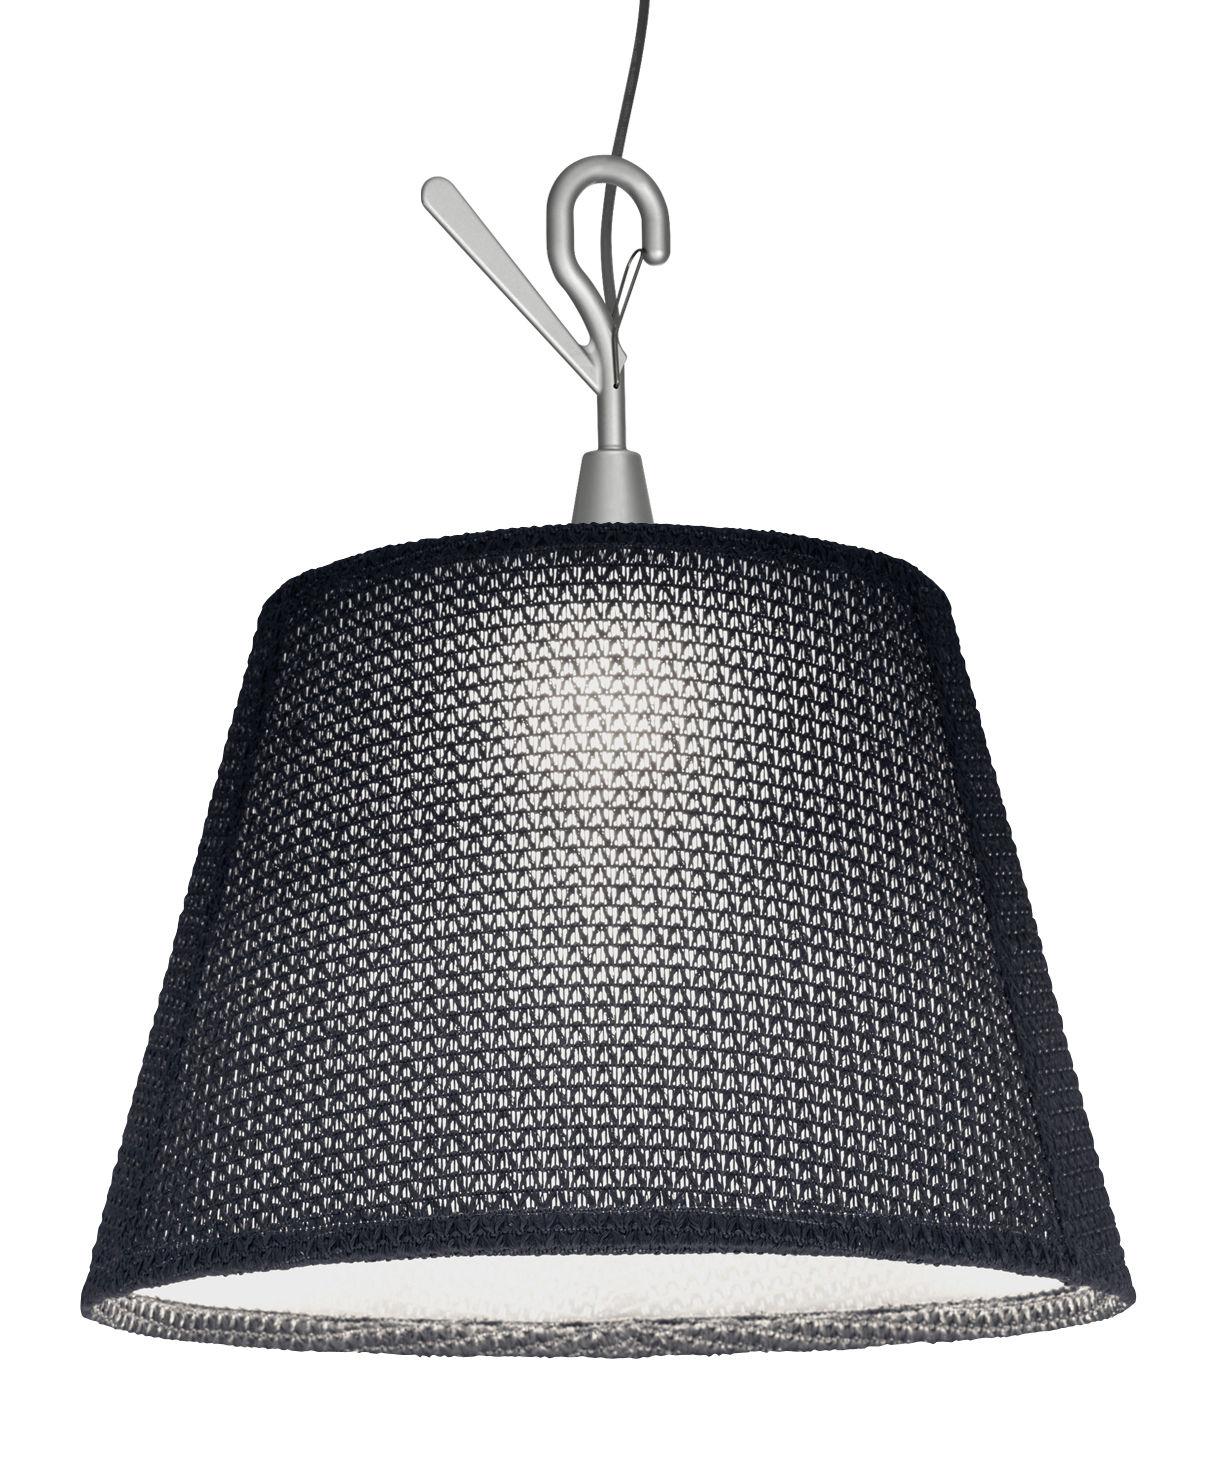 Leuchten - Tischleuchten - Tolomeo Paralume LED Outdoor Taschenlampe outdoorgeeignet / Handlampe zum Aufhängen - LED - Artemide - Grau - Aluminium, Thuia-Stoff